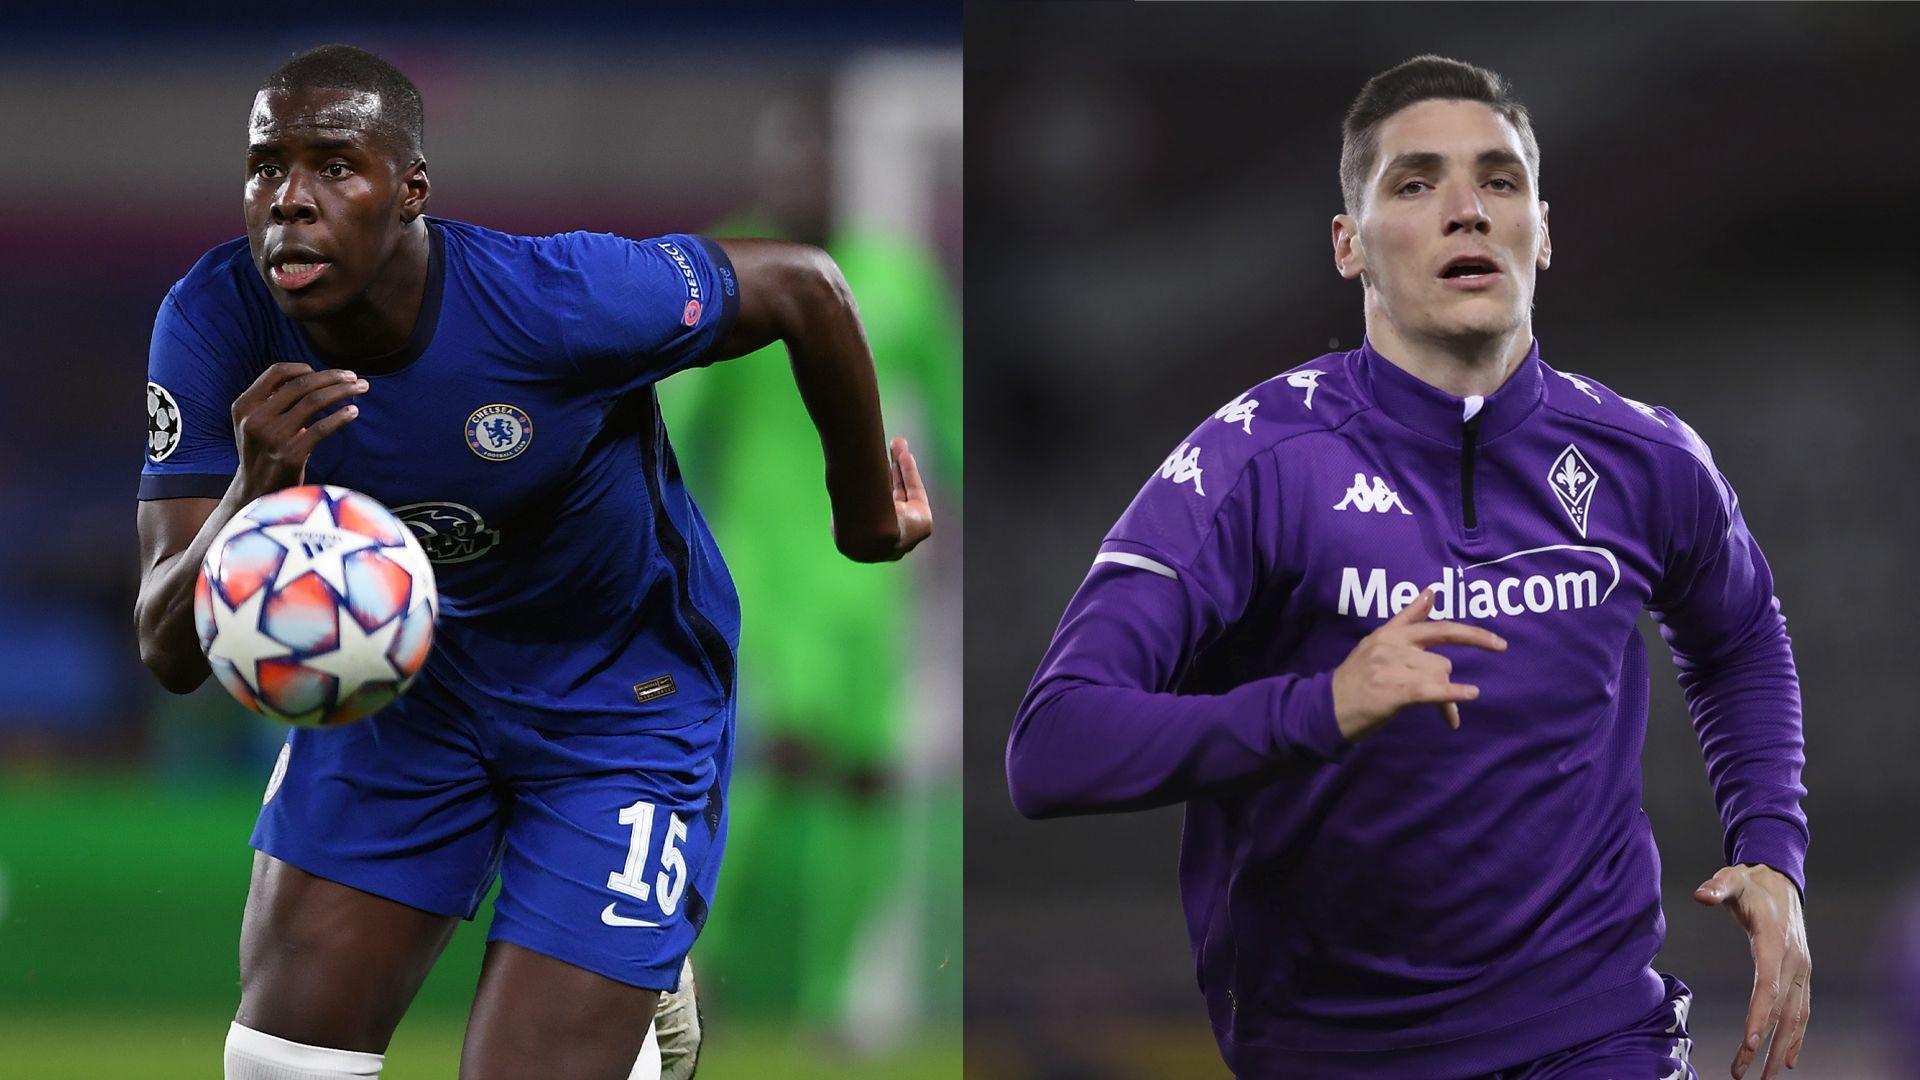 West Ham's Zouma deal difficult; Milenkovic talks held